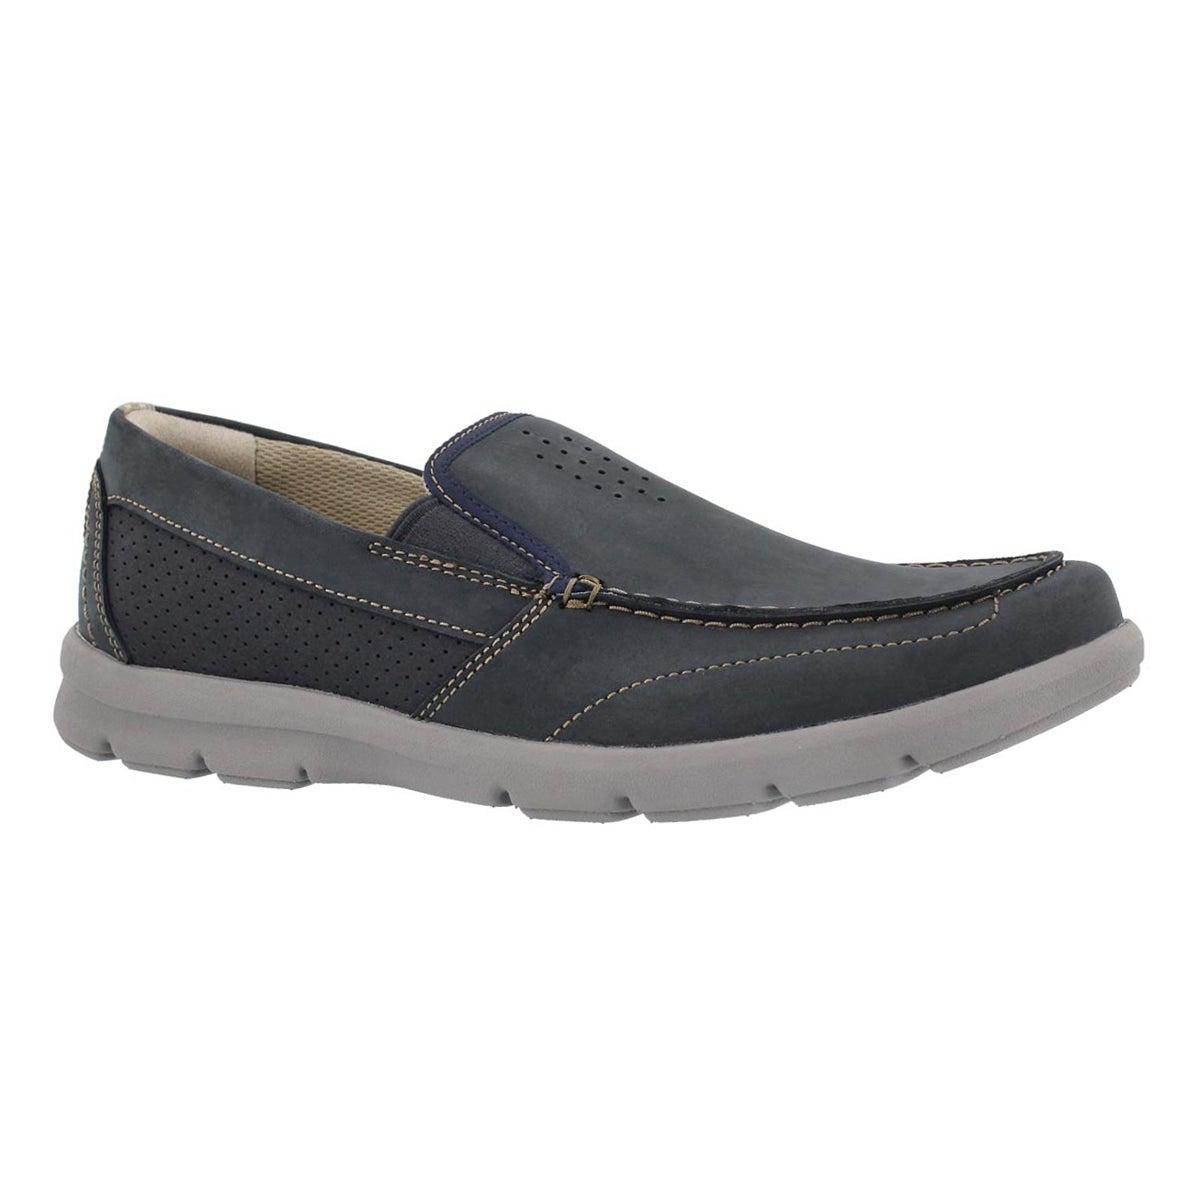 Men's JARWIN RACE navy casual slip on shoes